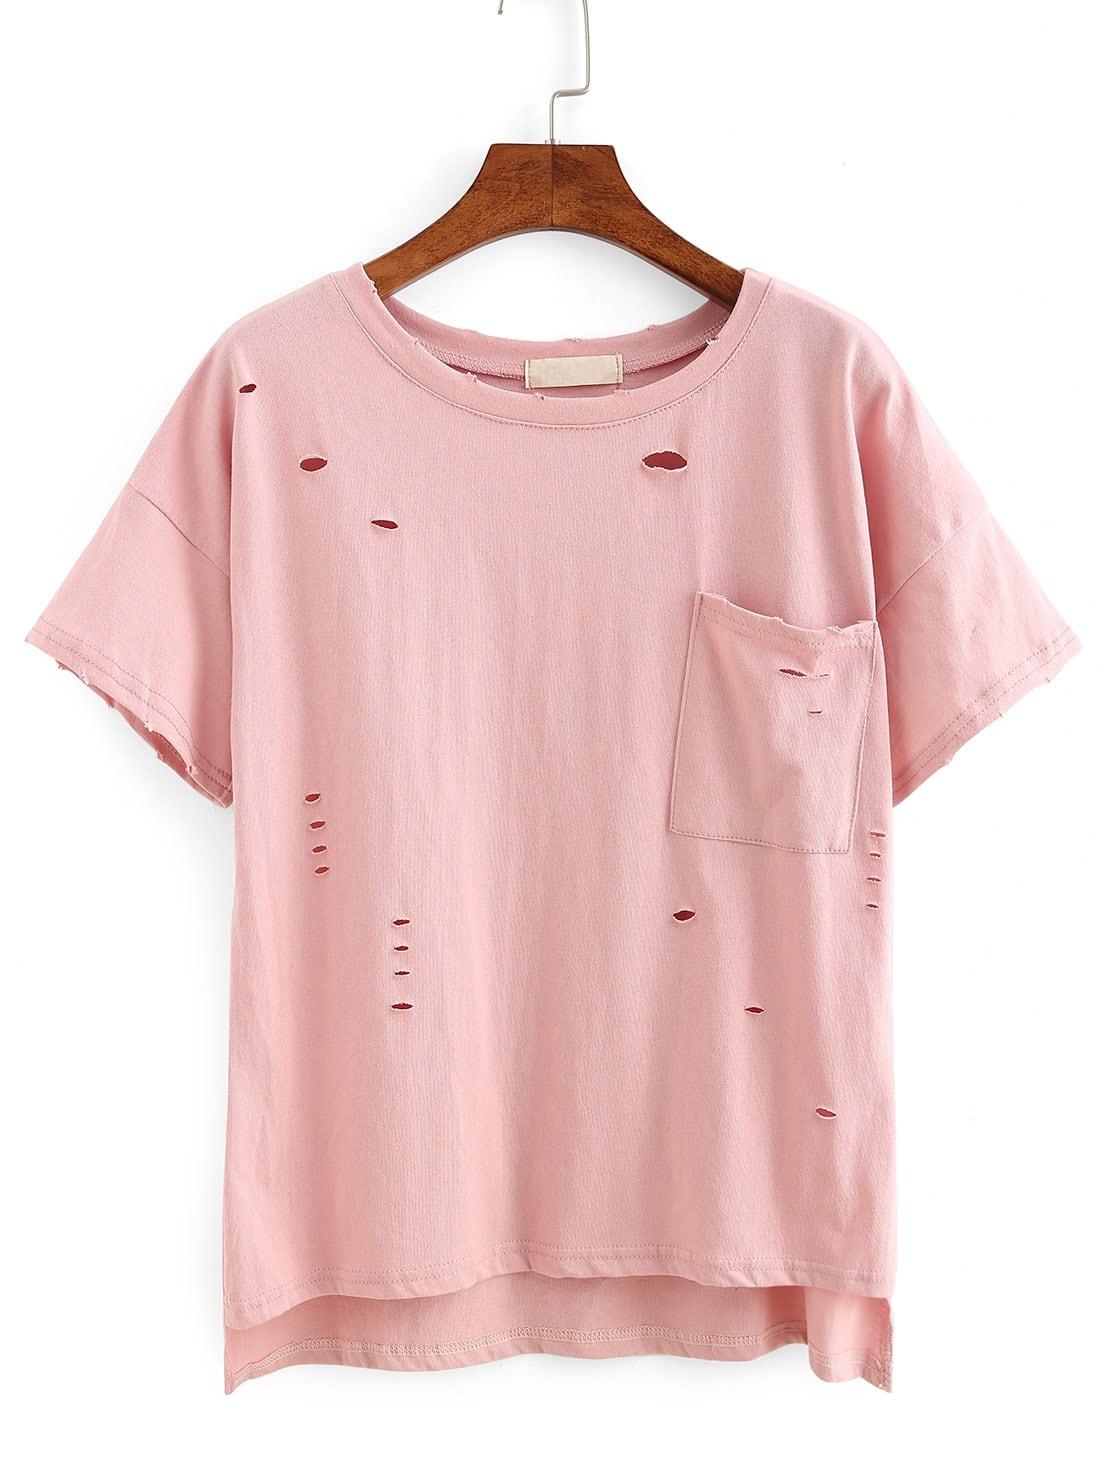 Фото Ripped High-Low Pocket T-shirt. Купить с доставкой